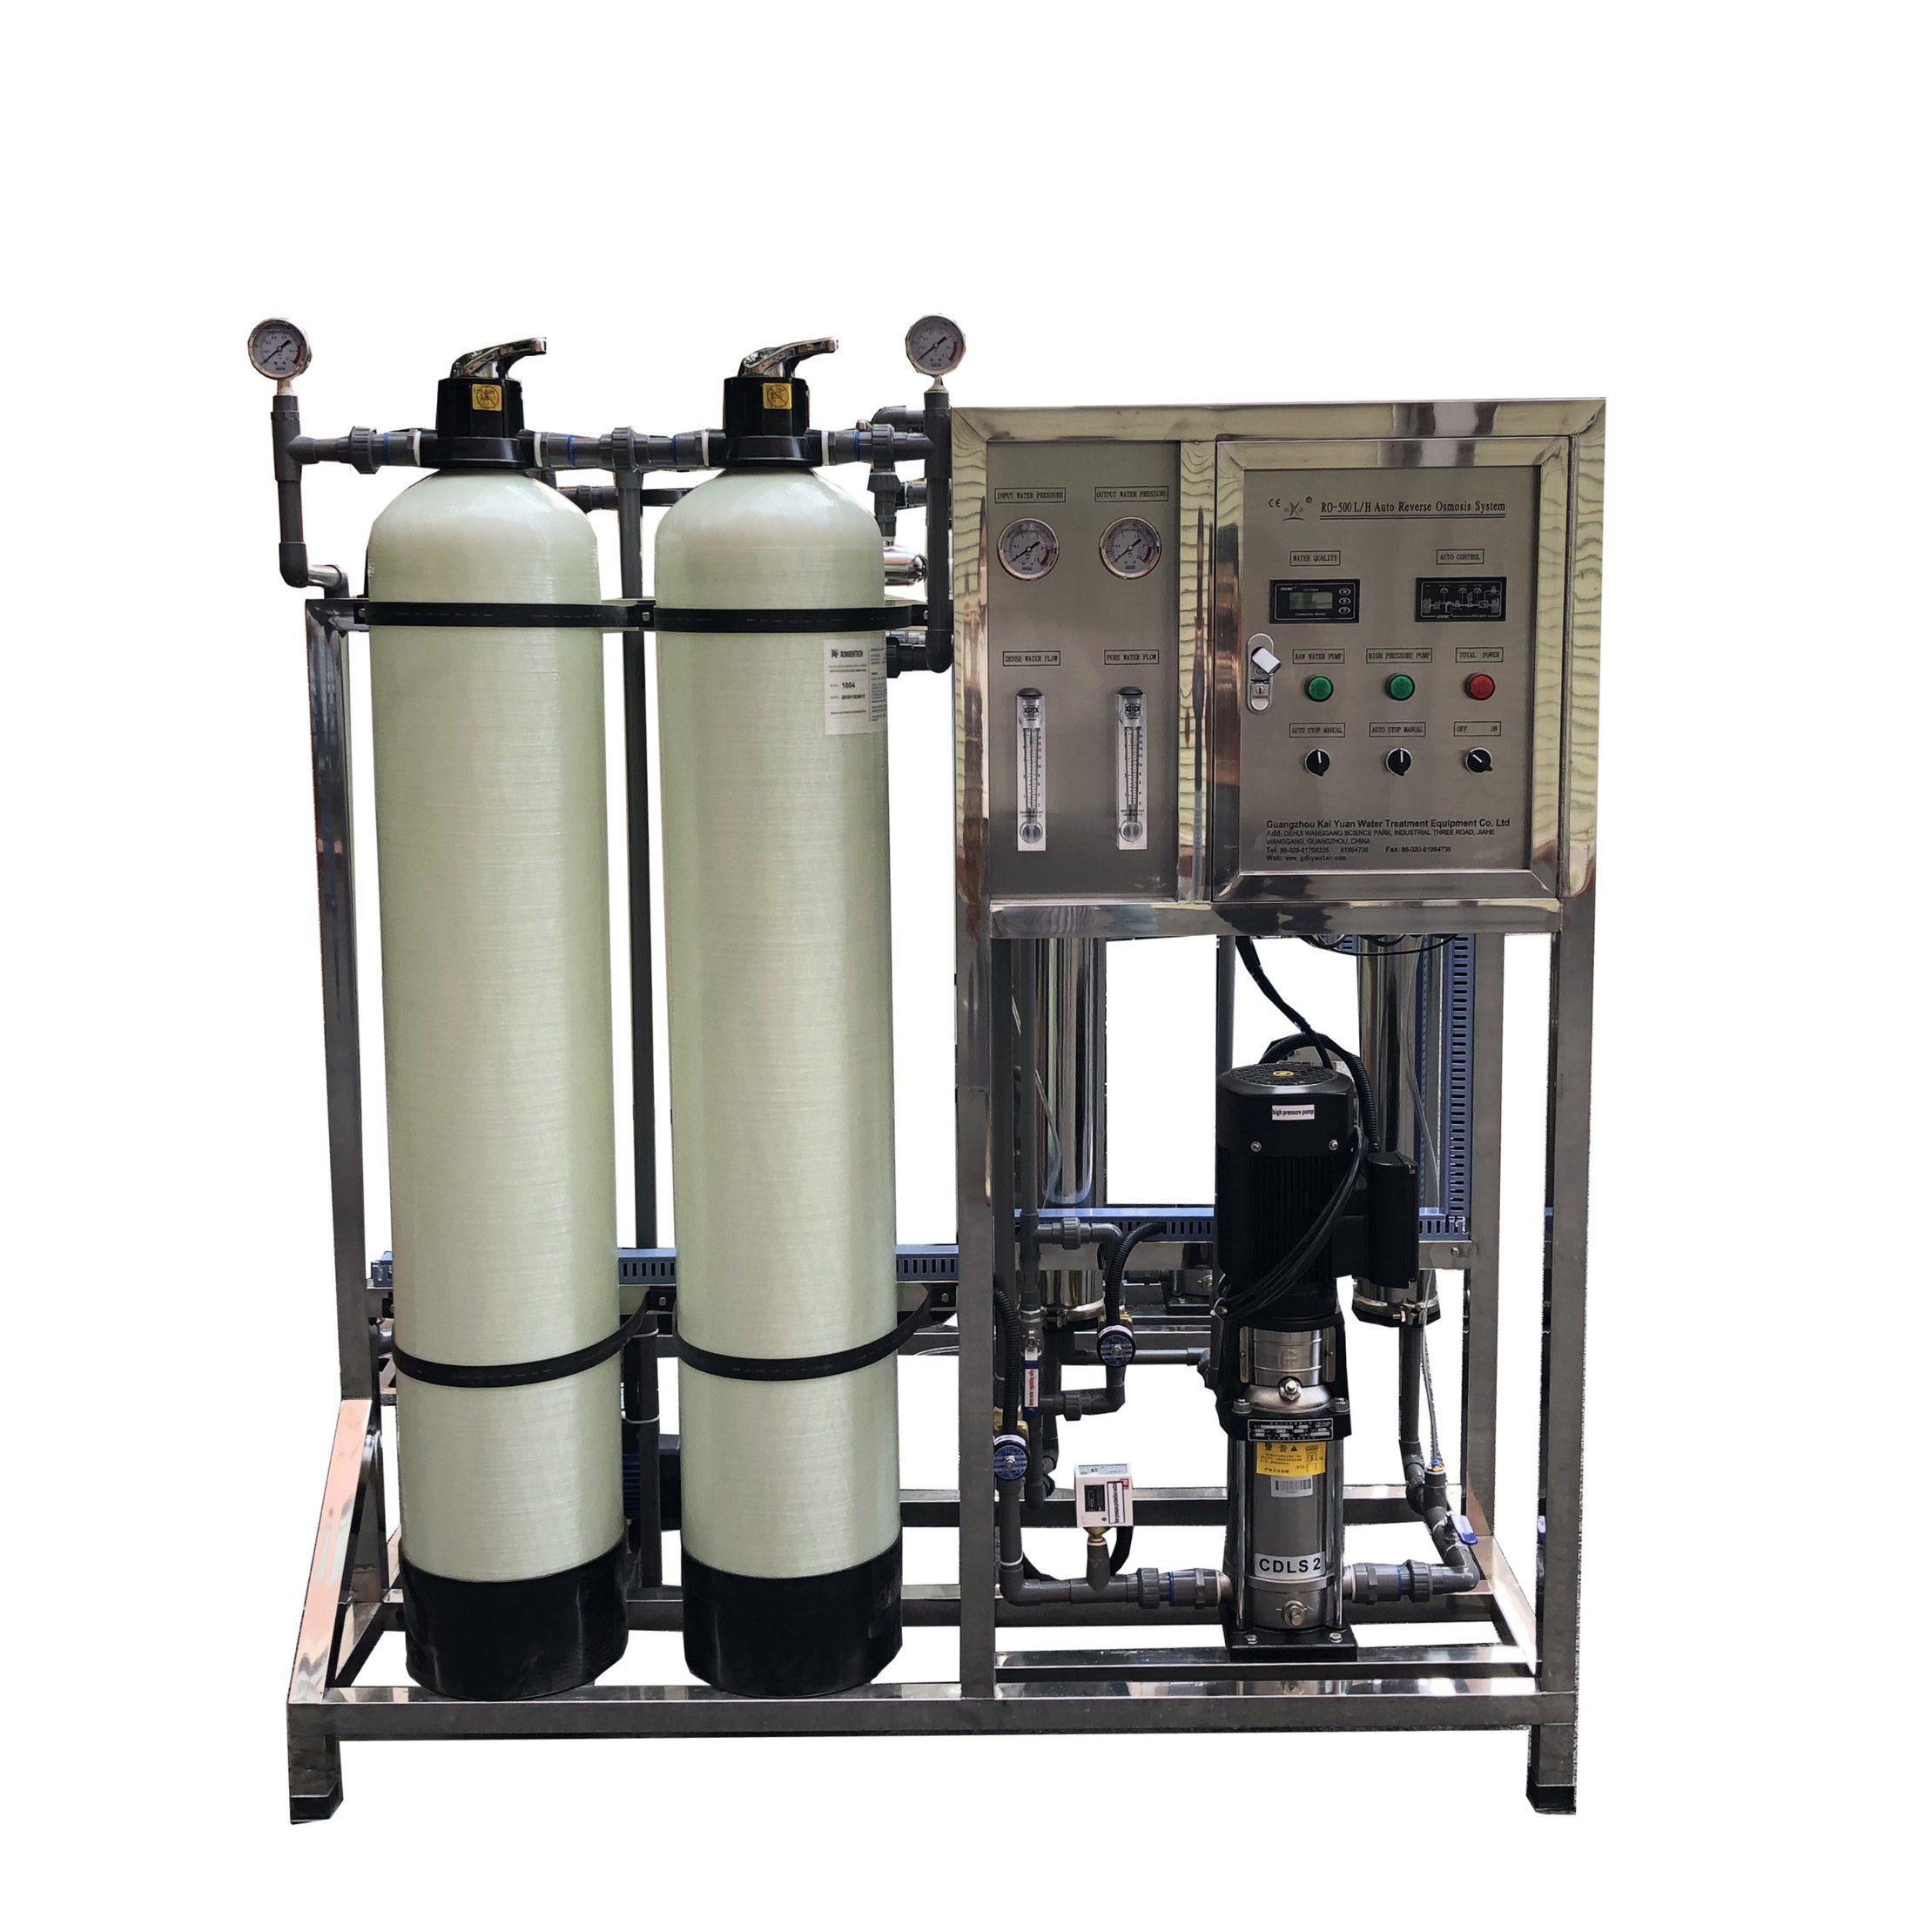 China Nigeria Market Pure Drinking Water Machine 500lph Small RO Water  Purifier/Water Filters - China Pure Drinkign Water Machine, 500lph RO Water  Filter